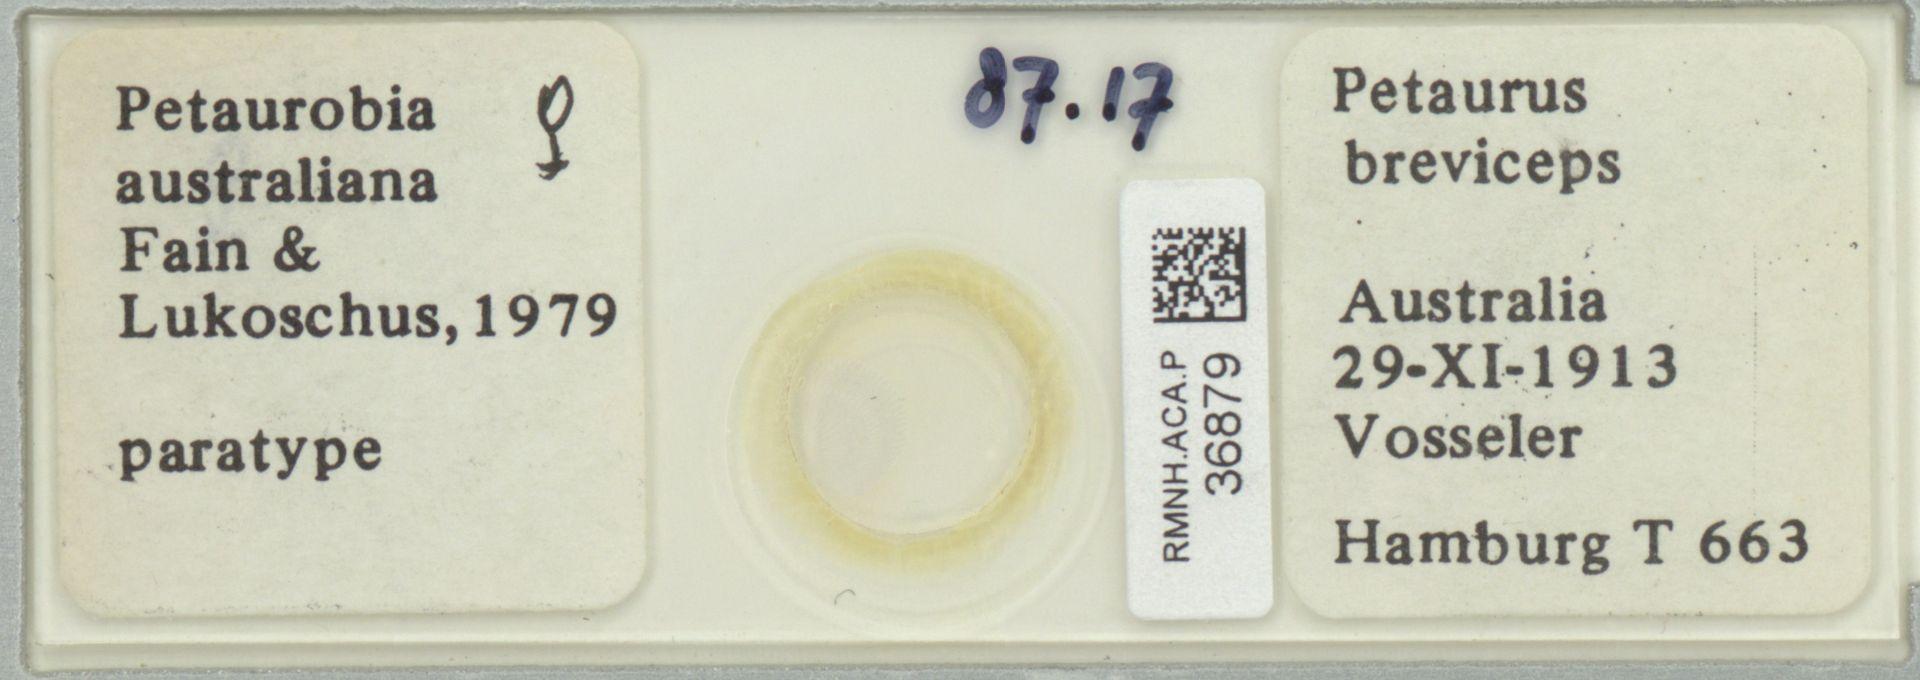 RMNH.ACA.P.36879   Petaurobia australiana Fain & Lukoschus, 1979